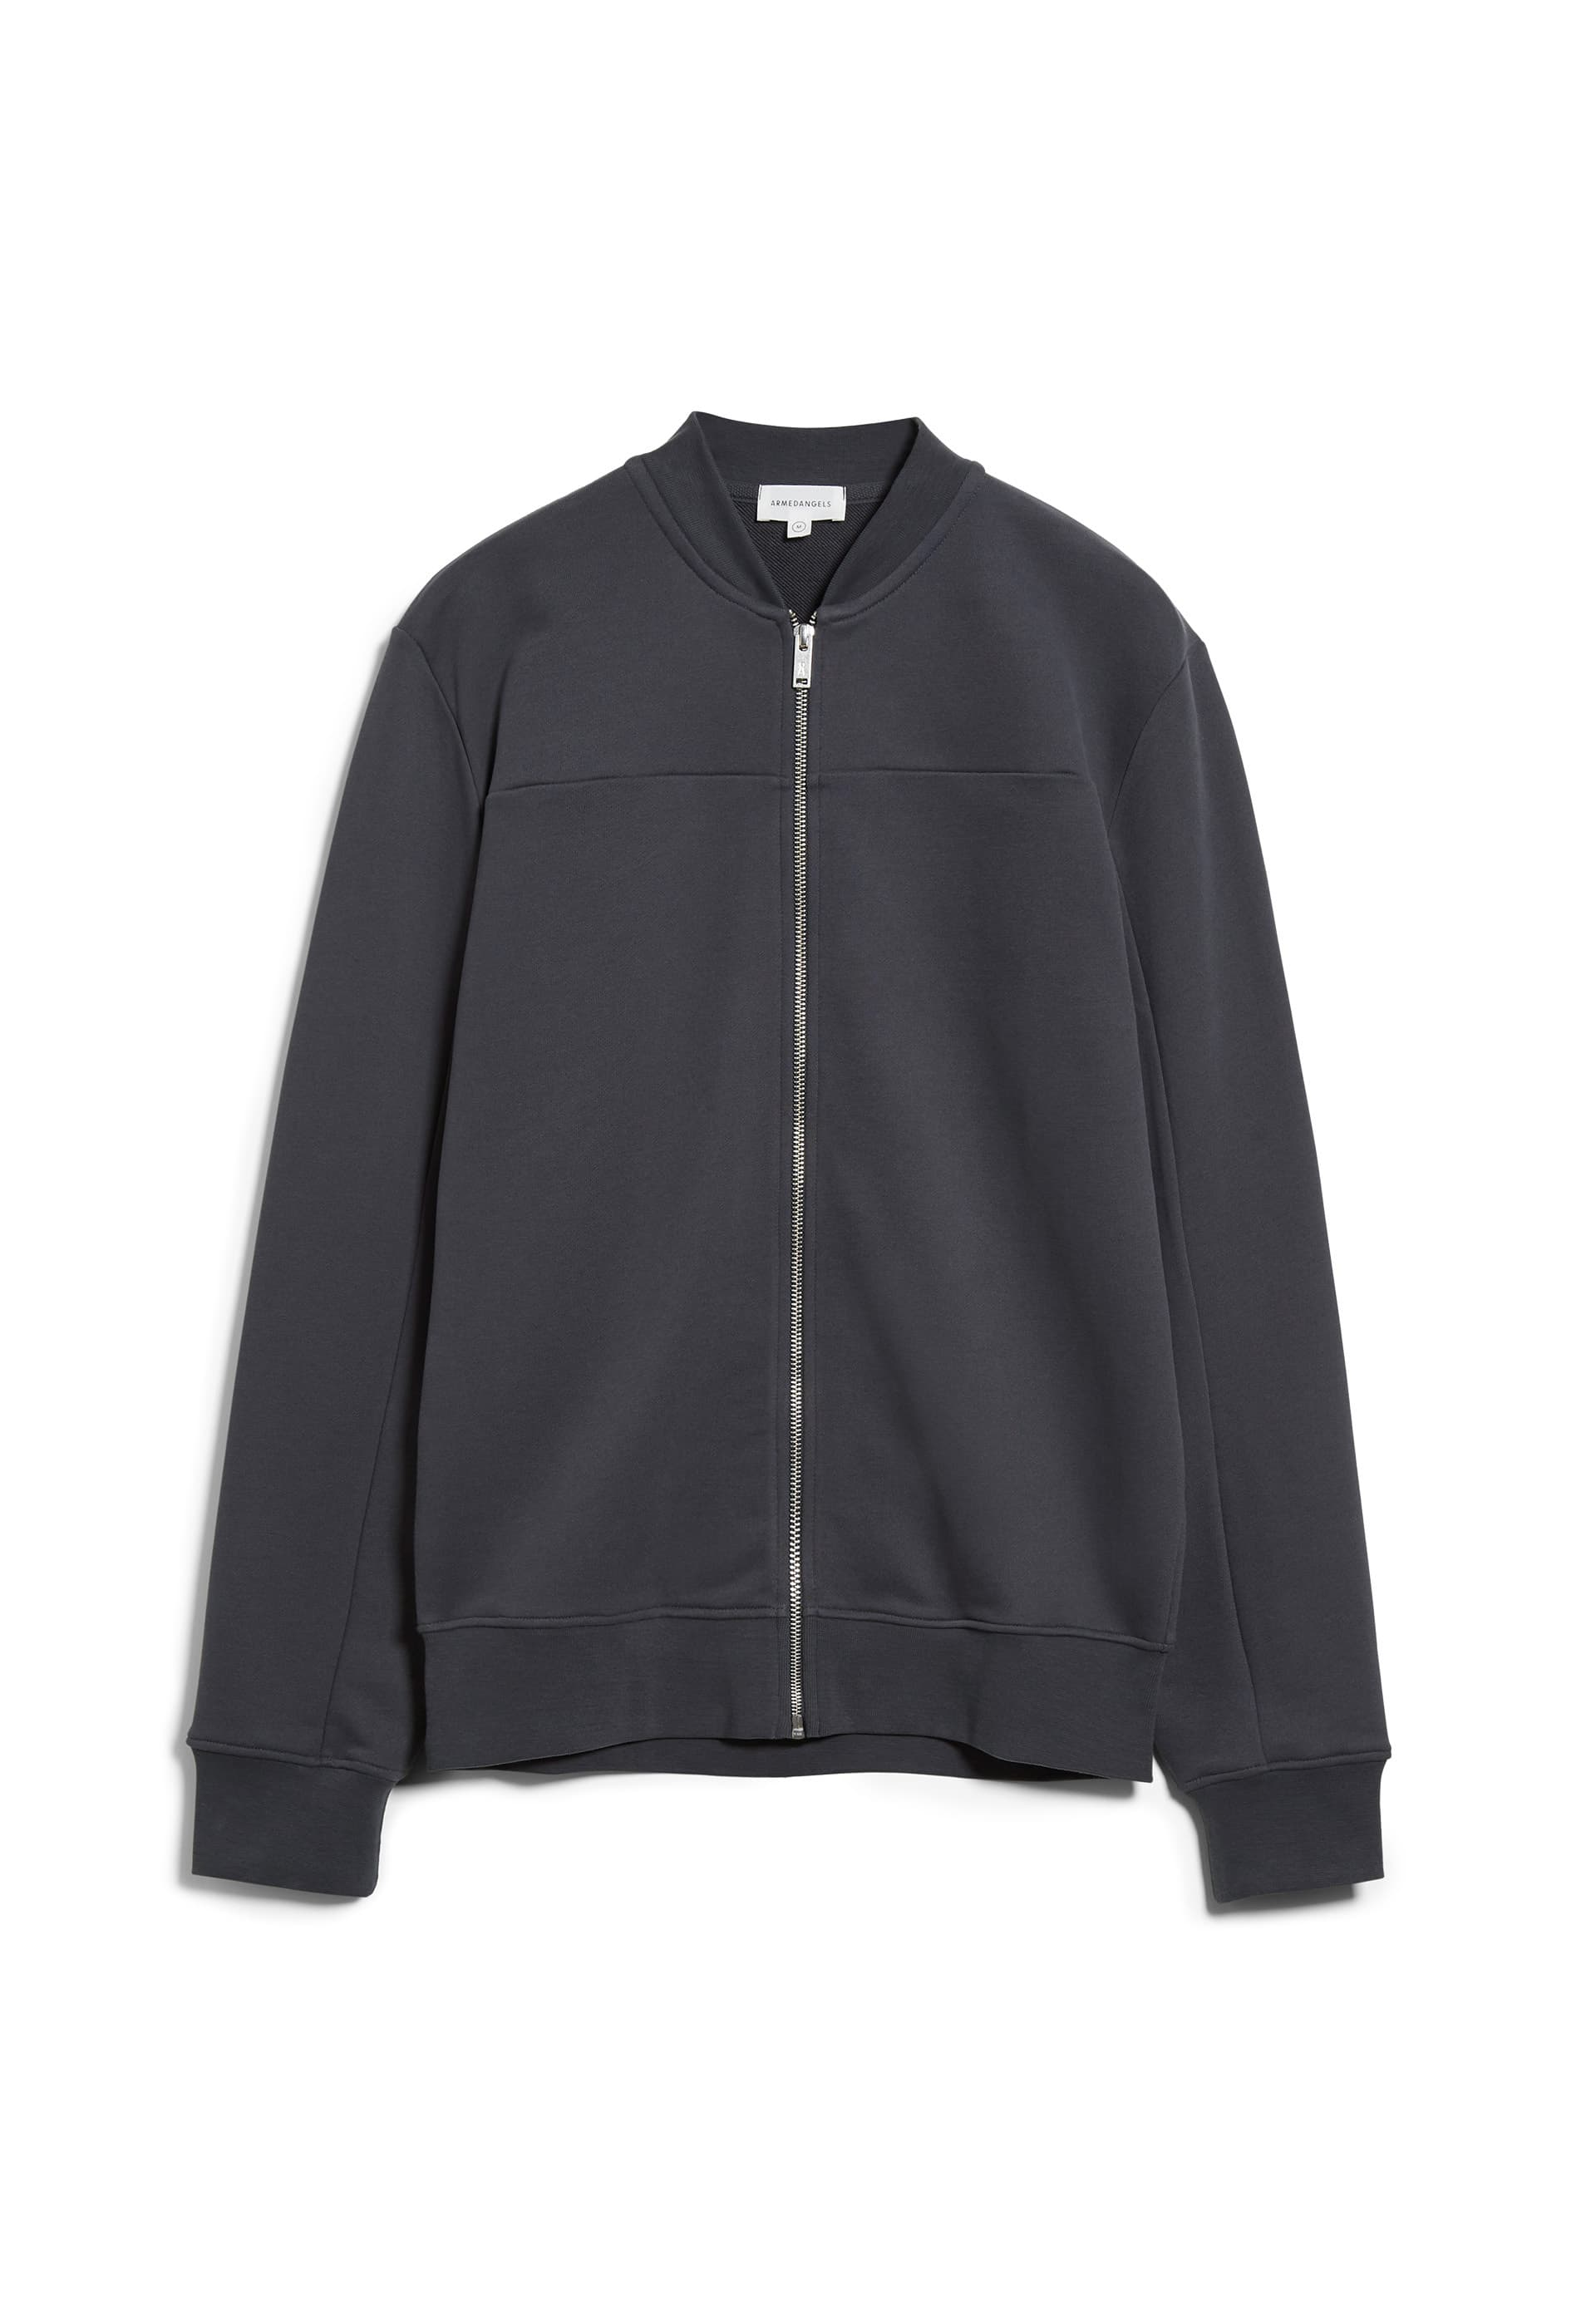 AALRIK Sweatjacket made of Organic Cotton